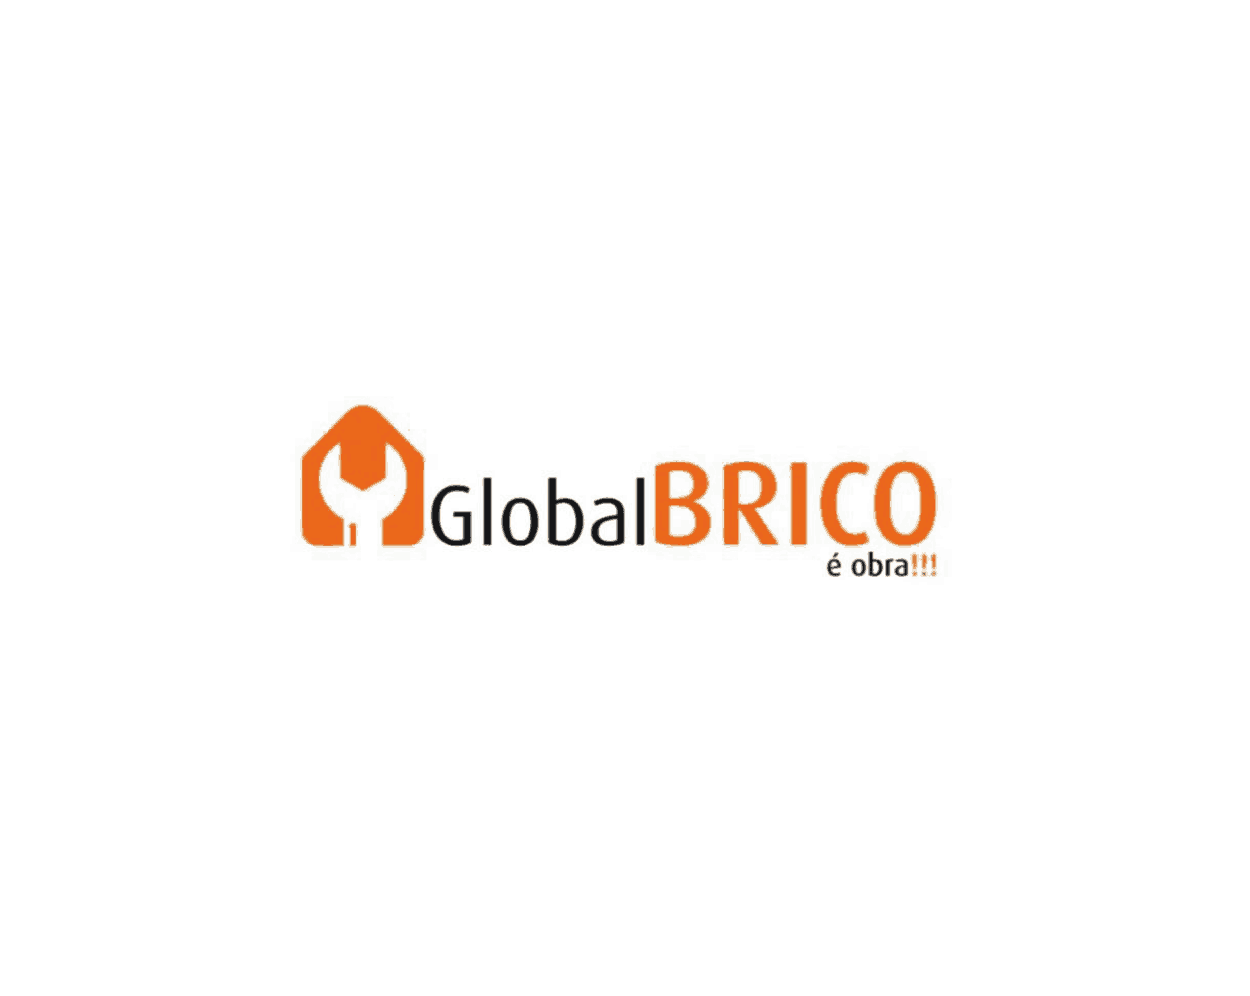 GlobalBrico